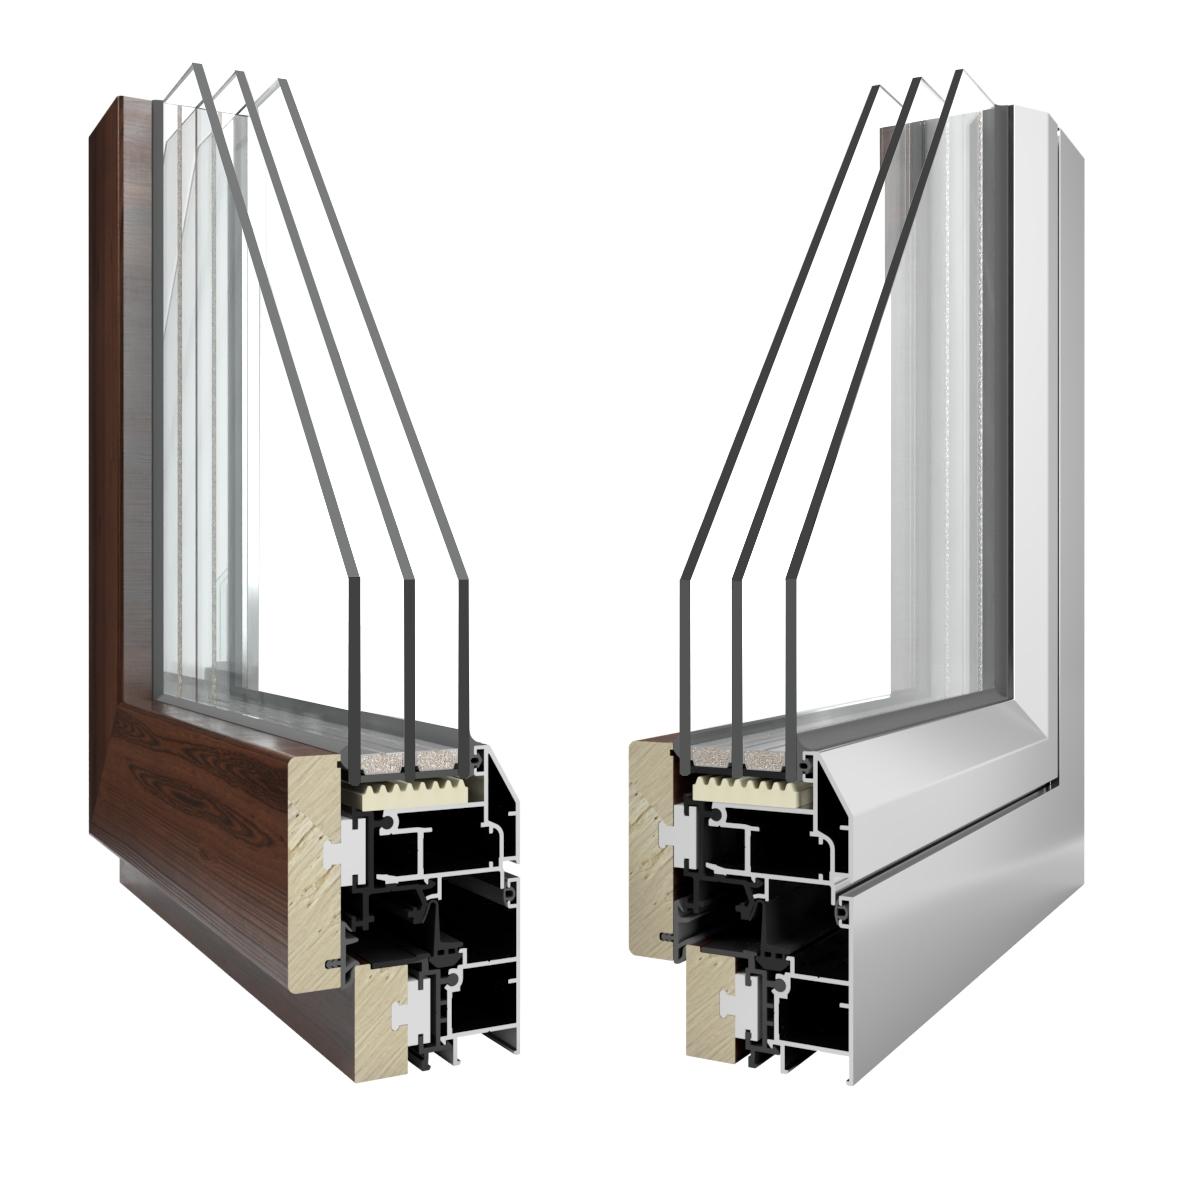 https://www.allpaint.it/wp-content/uploads/2021/07/finestre-alluminio-legno-woodlinett-plus-allpaint-1.jpg